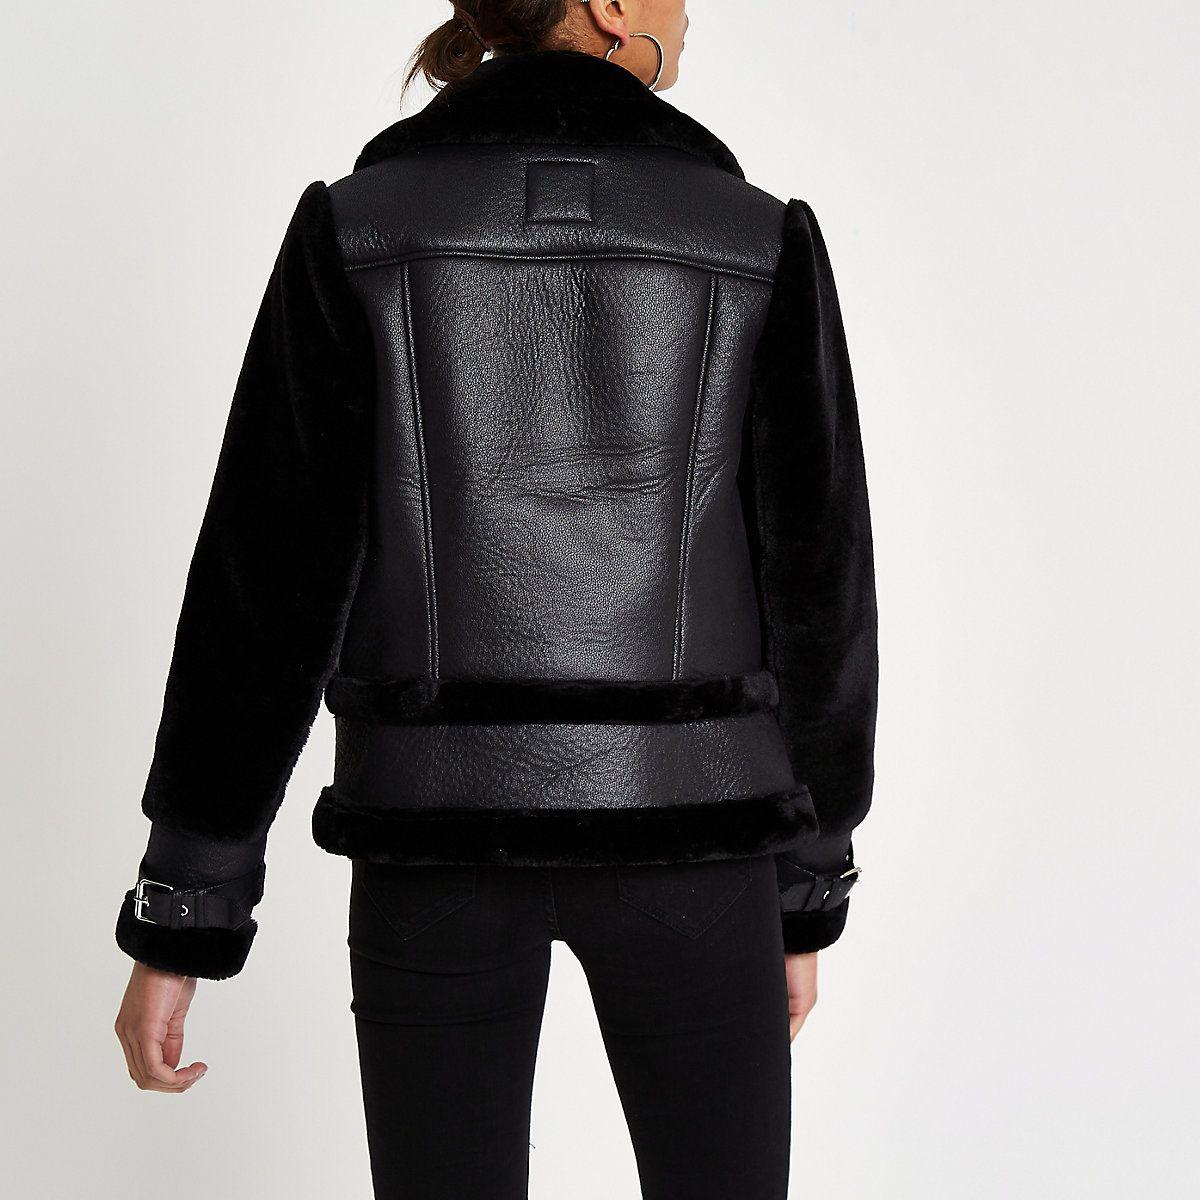 Black faux fur aviator jacket Aviator jackets, Jackets